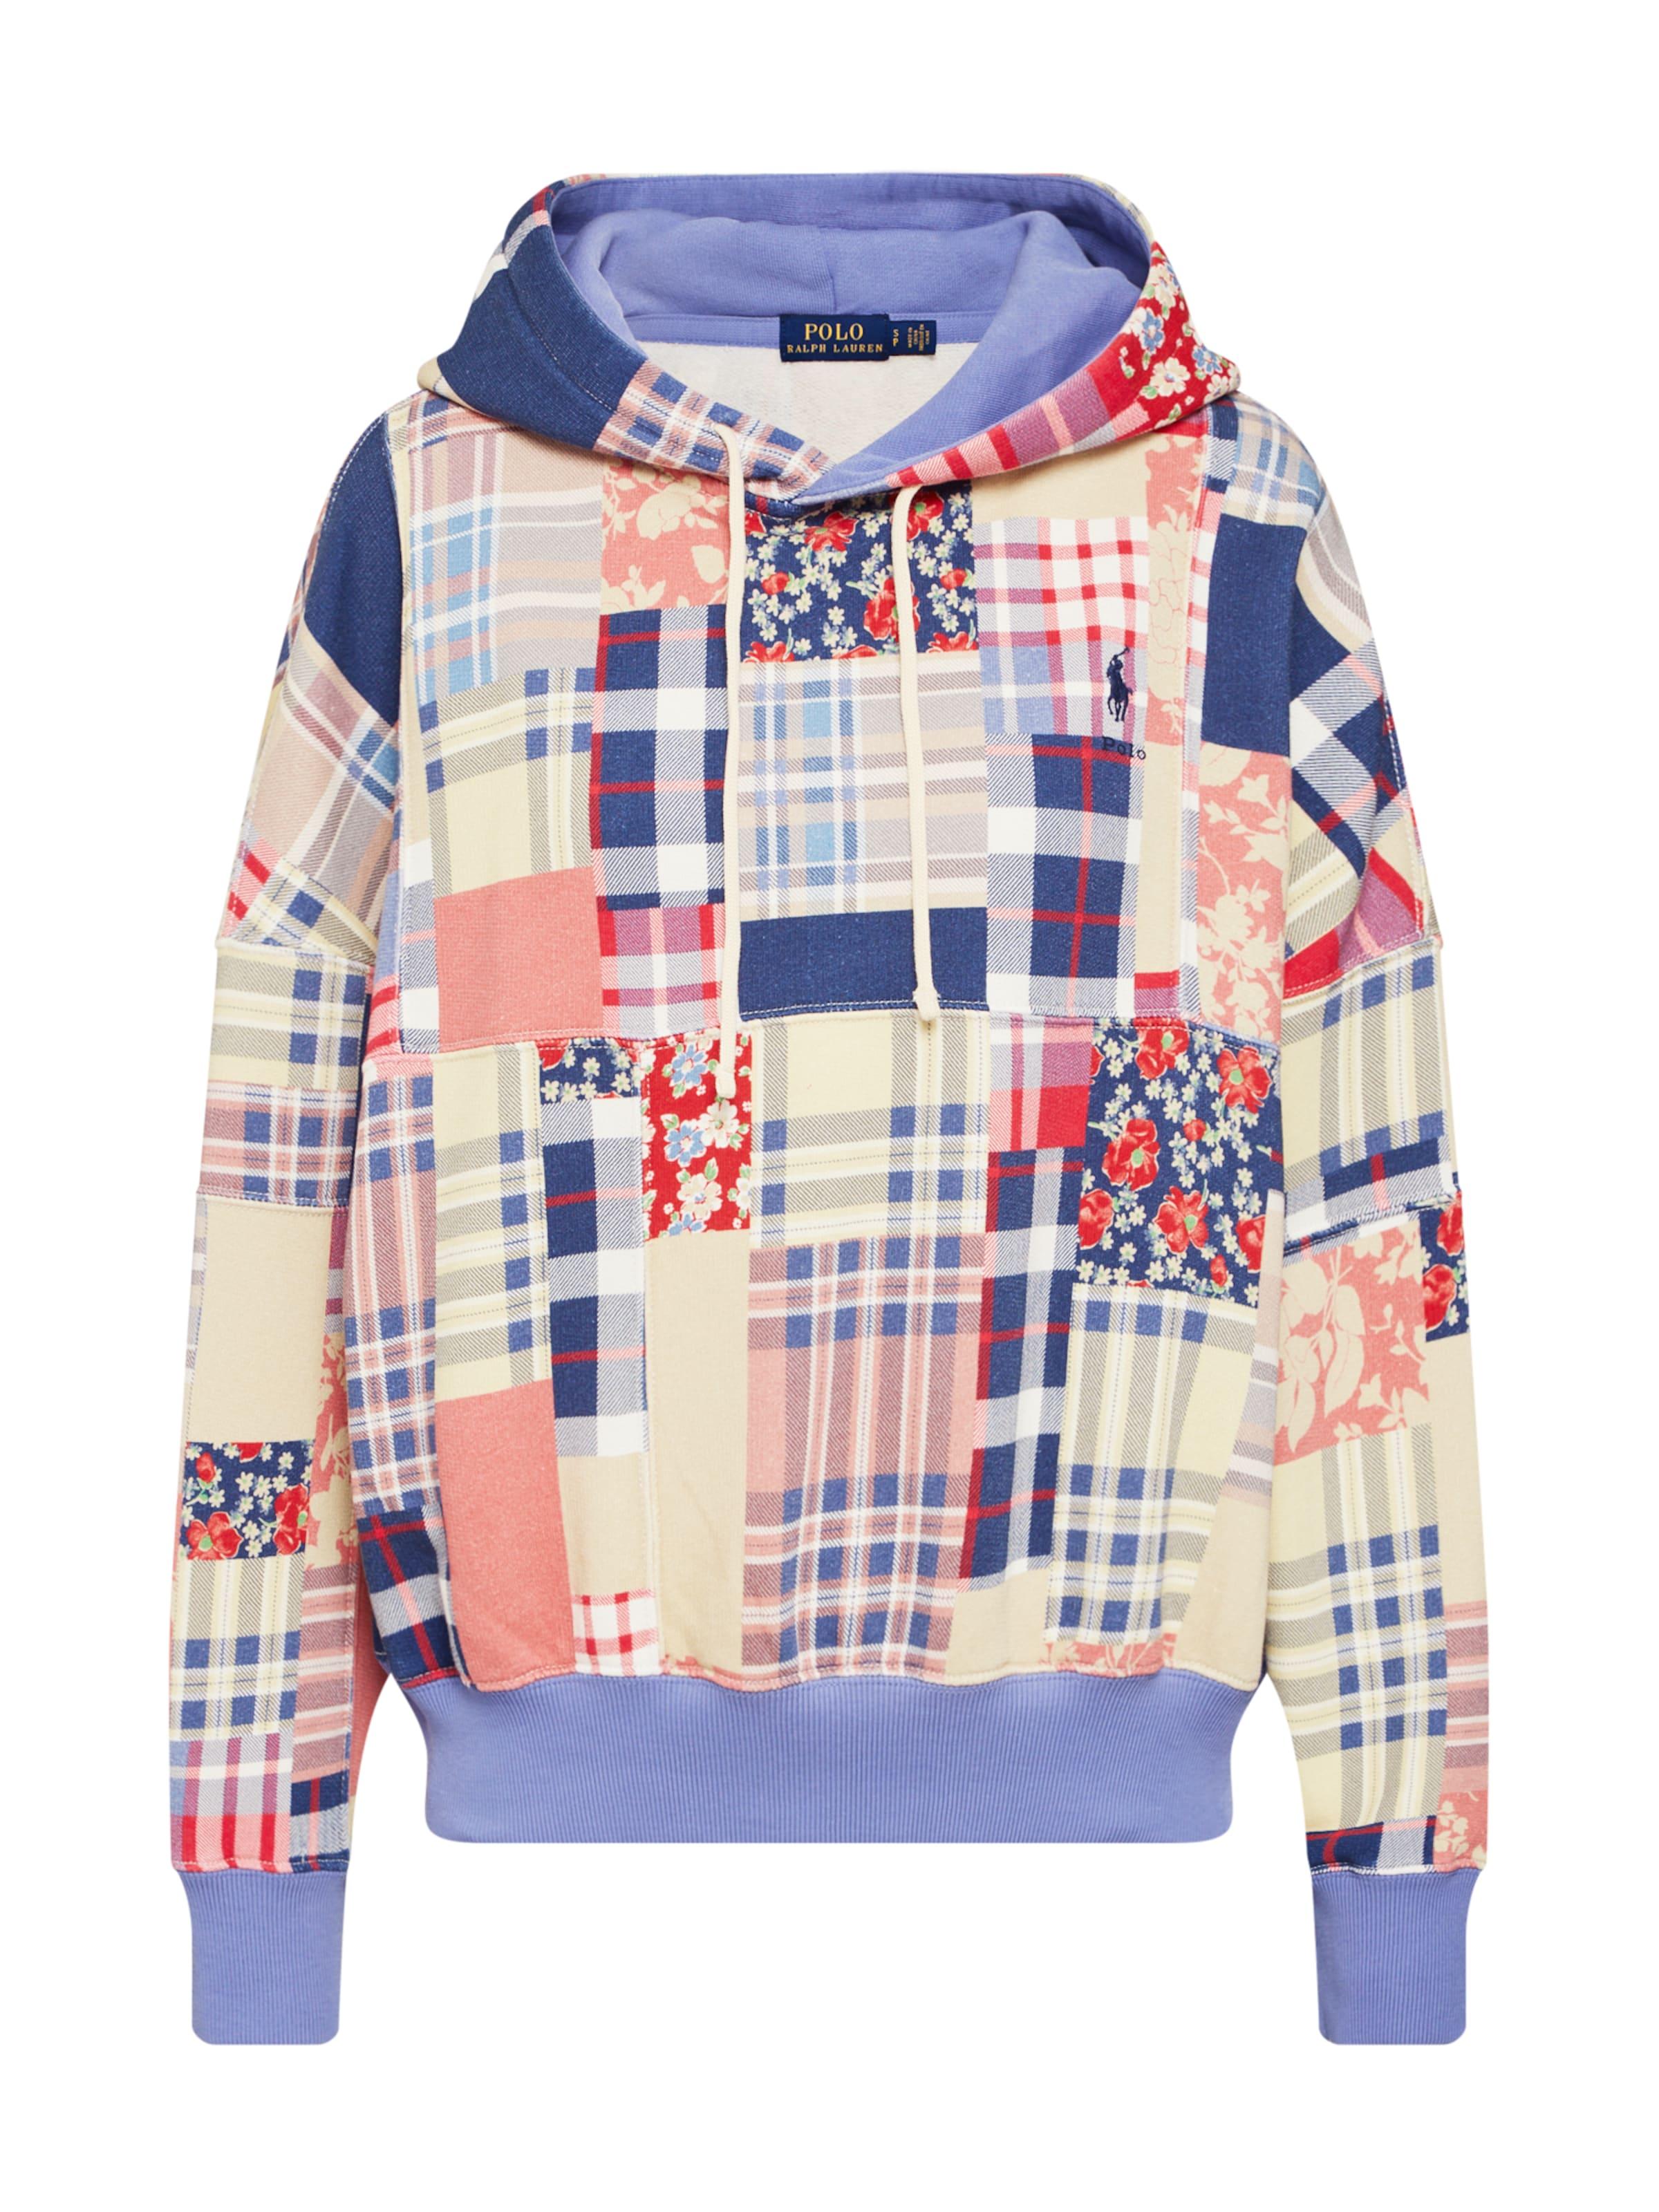 Sweat 'rlxd shirt Ralph Lauren knit' En Couleurs long Ptch Mélange De Hd Polo Sleeve FKJcl1